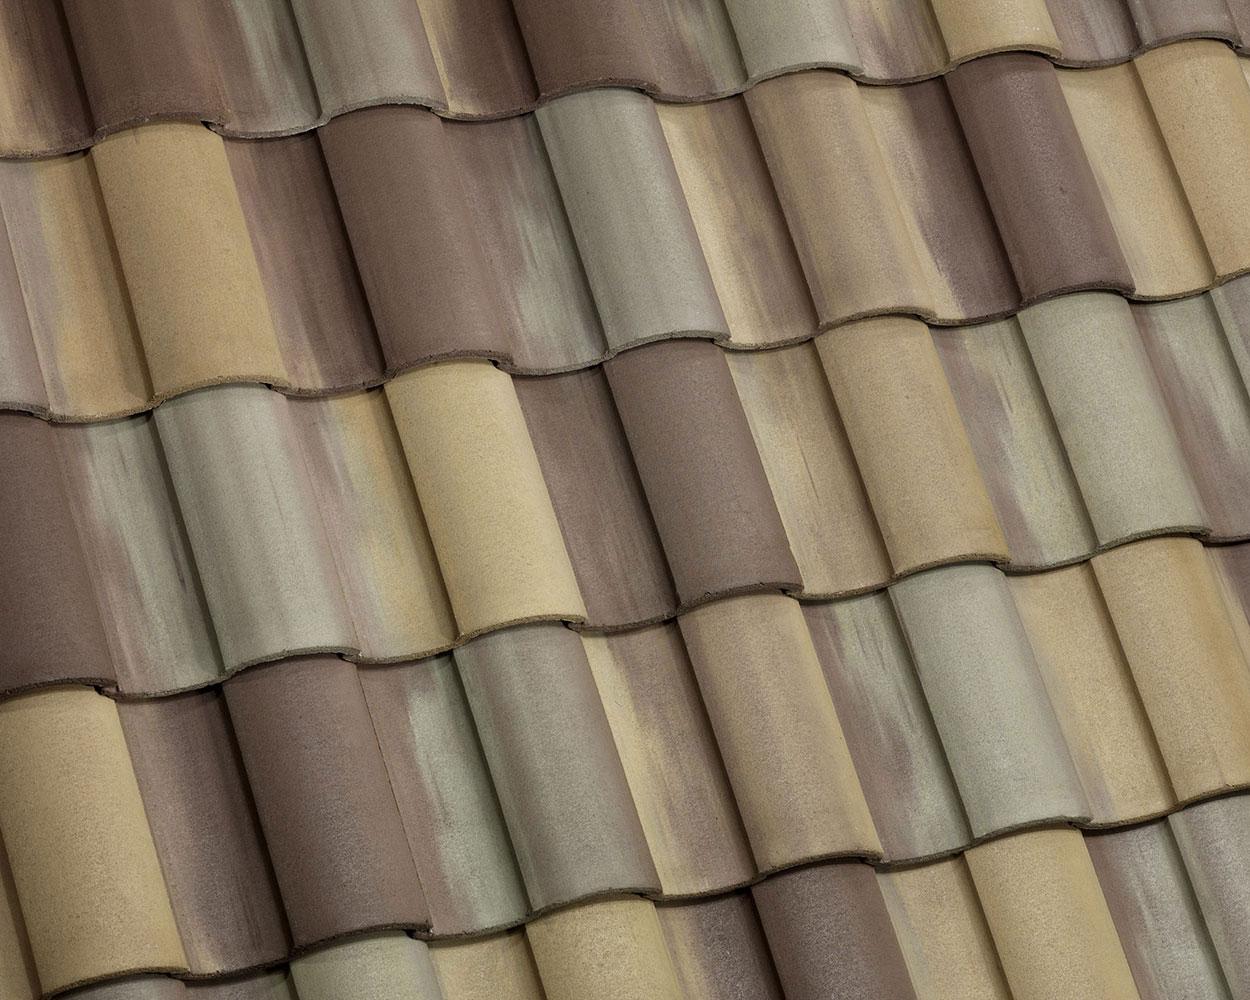 Tile Roofing Estate Roofing